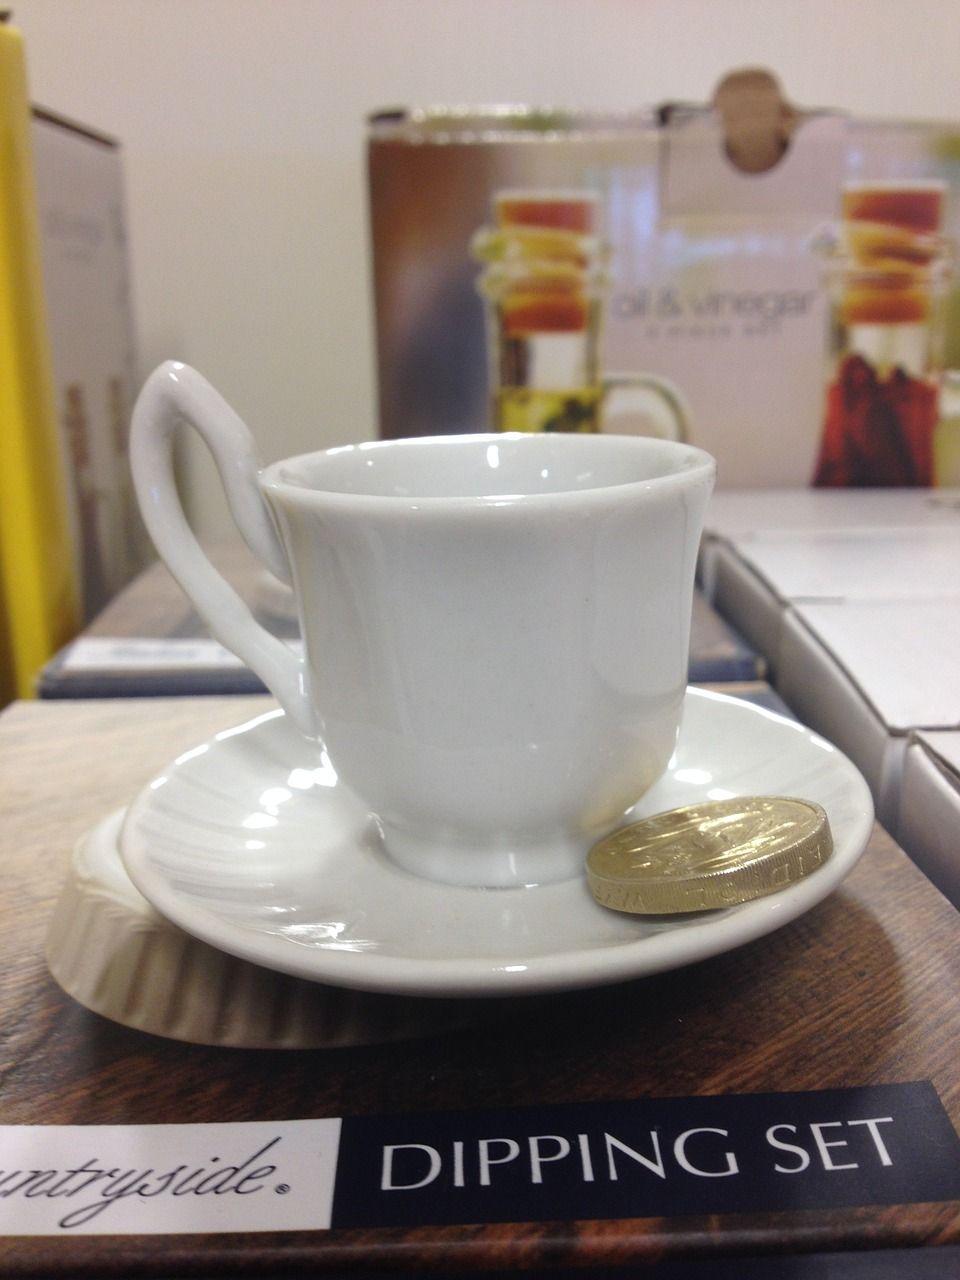 Coffee coffee break caffeine beverage drink coffee